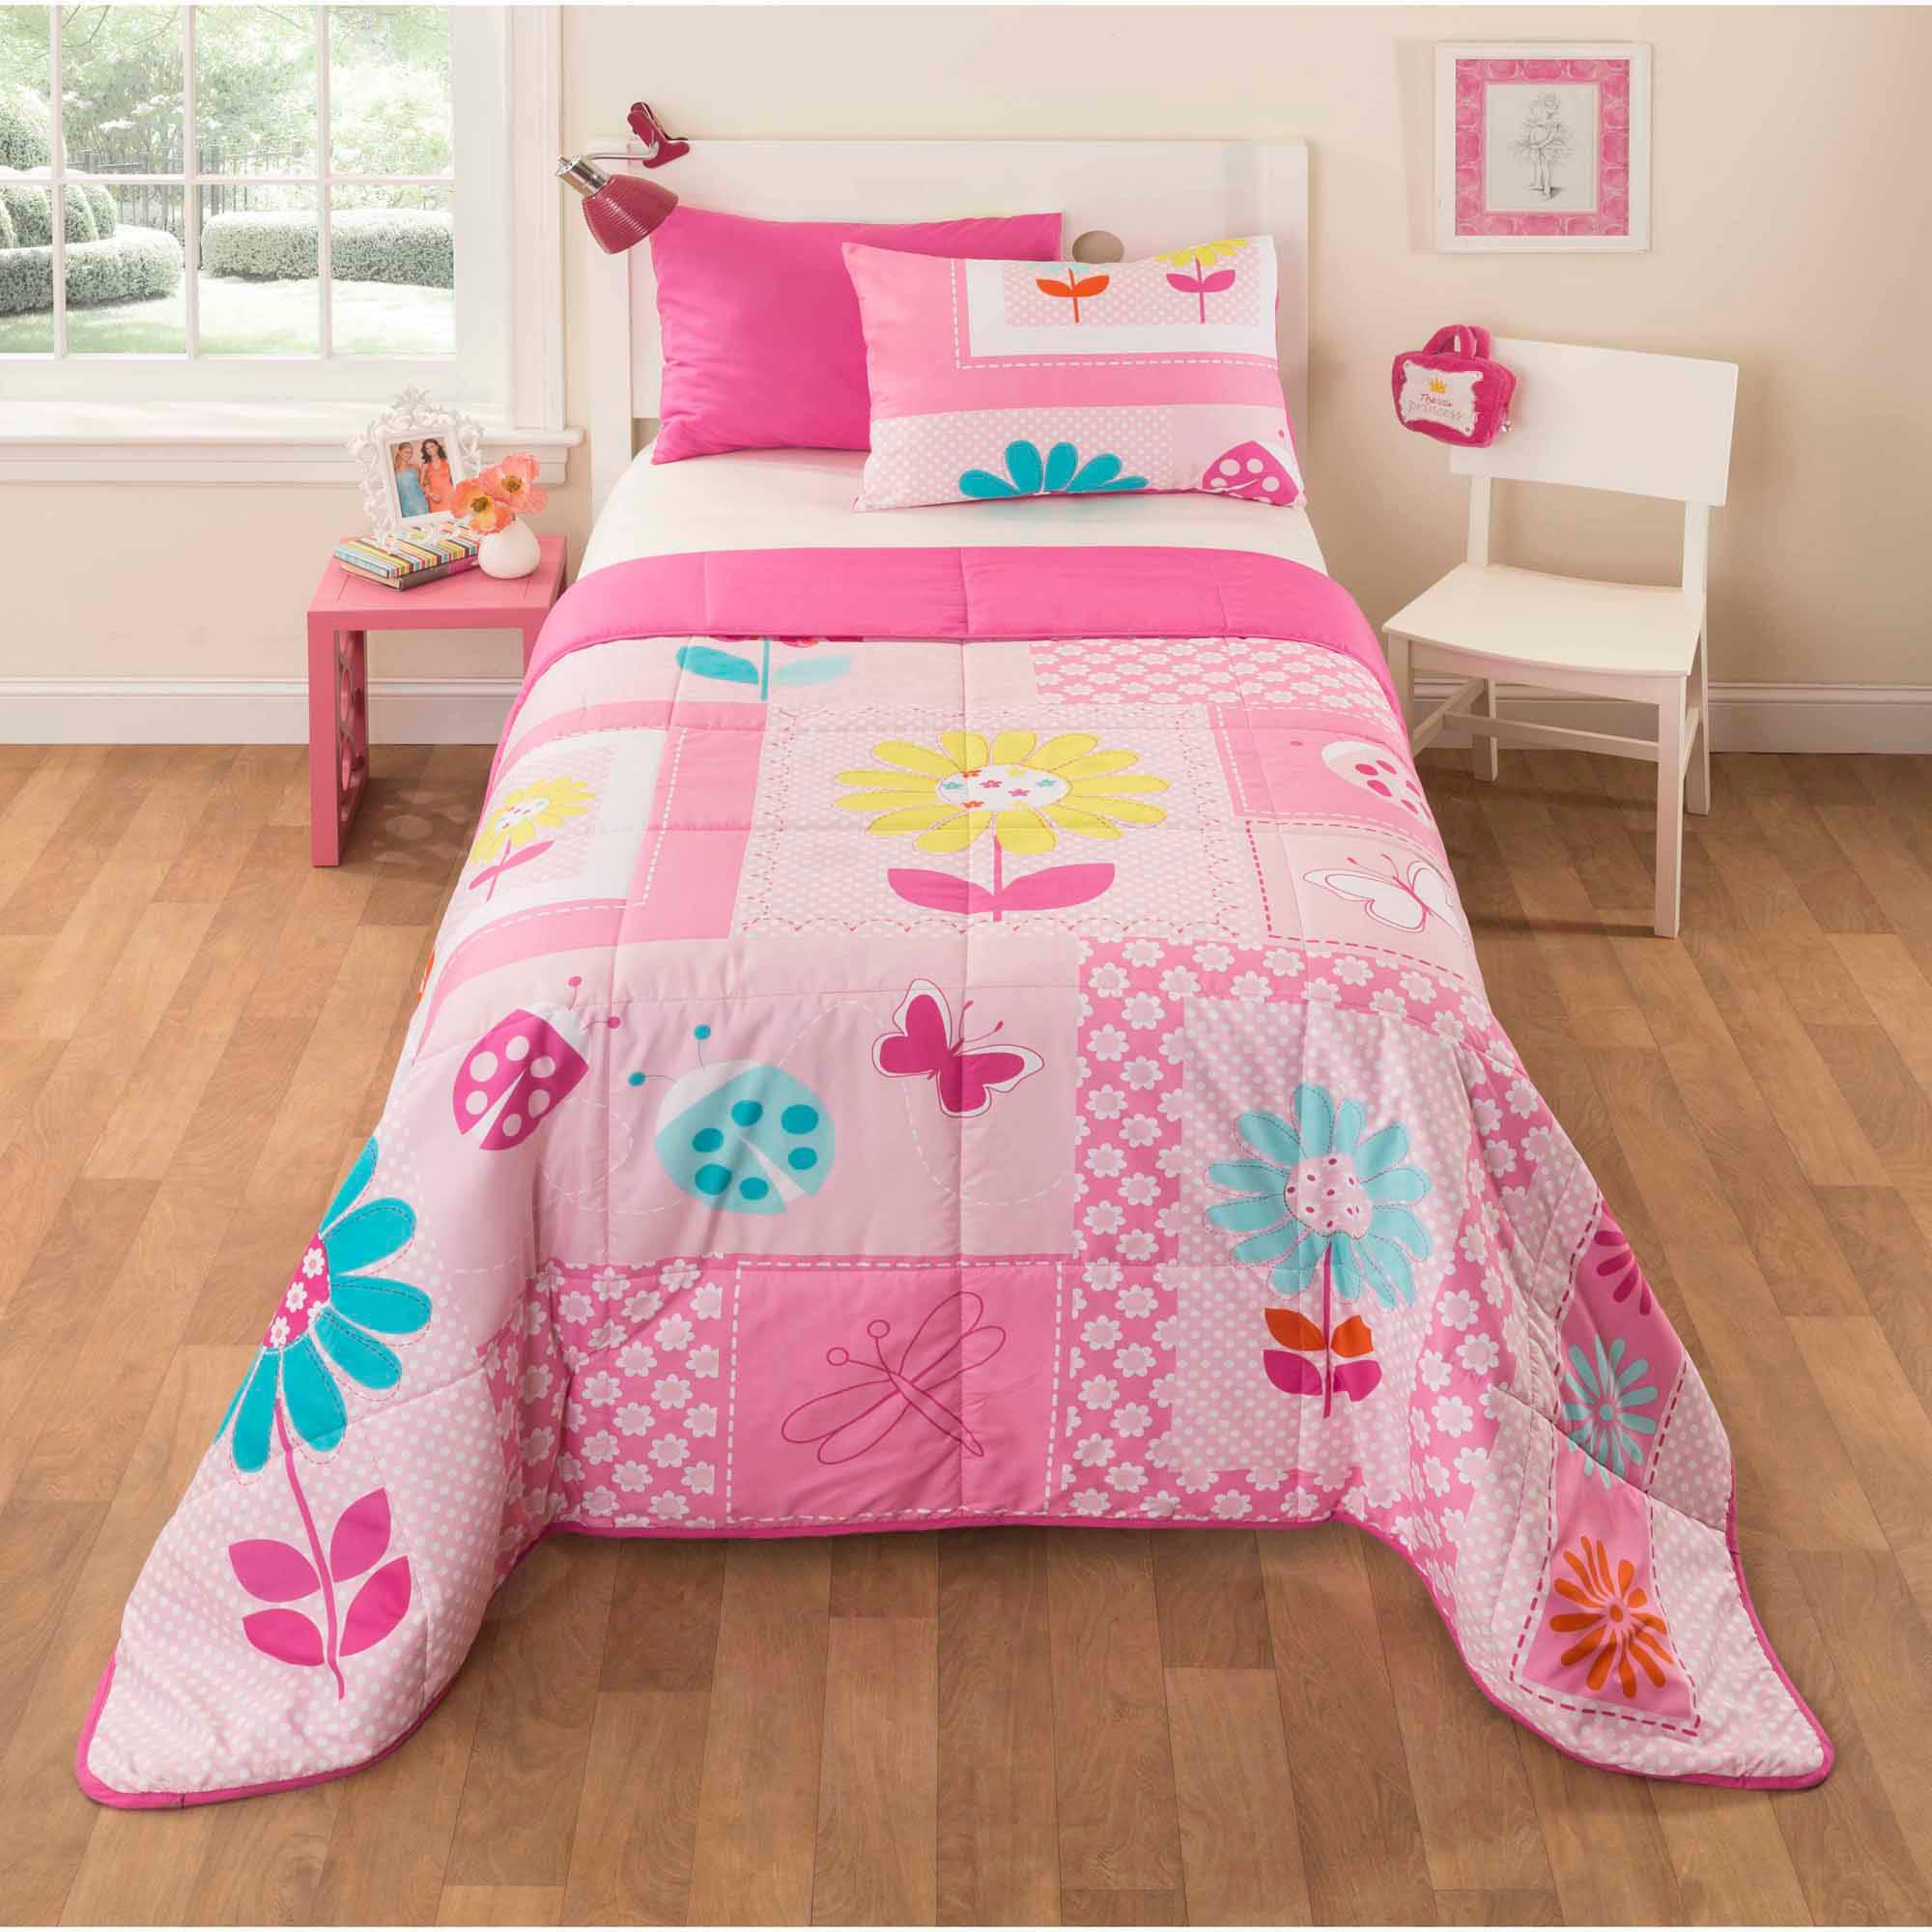 Mainstays Kids Daisy Floral Bedding Comforter Set